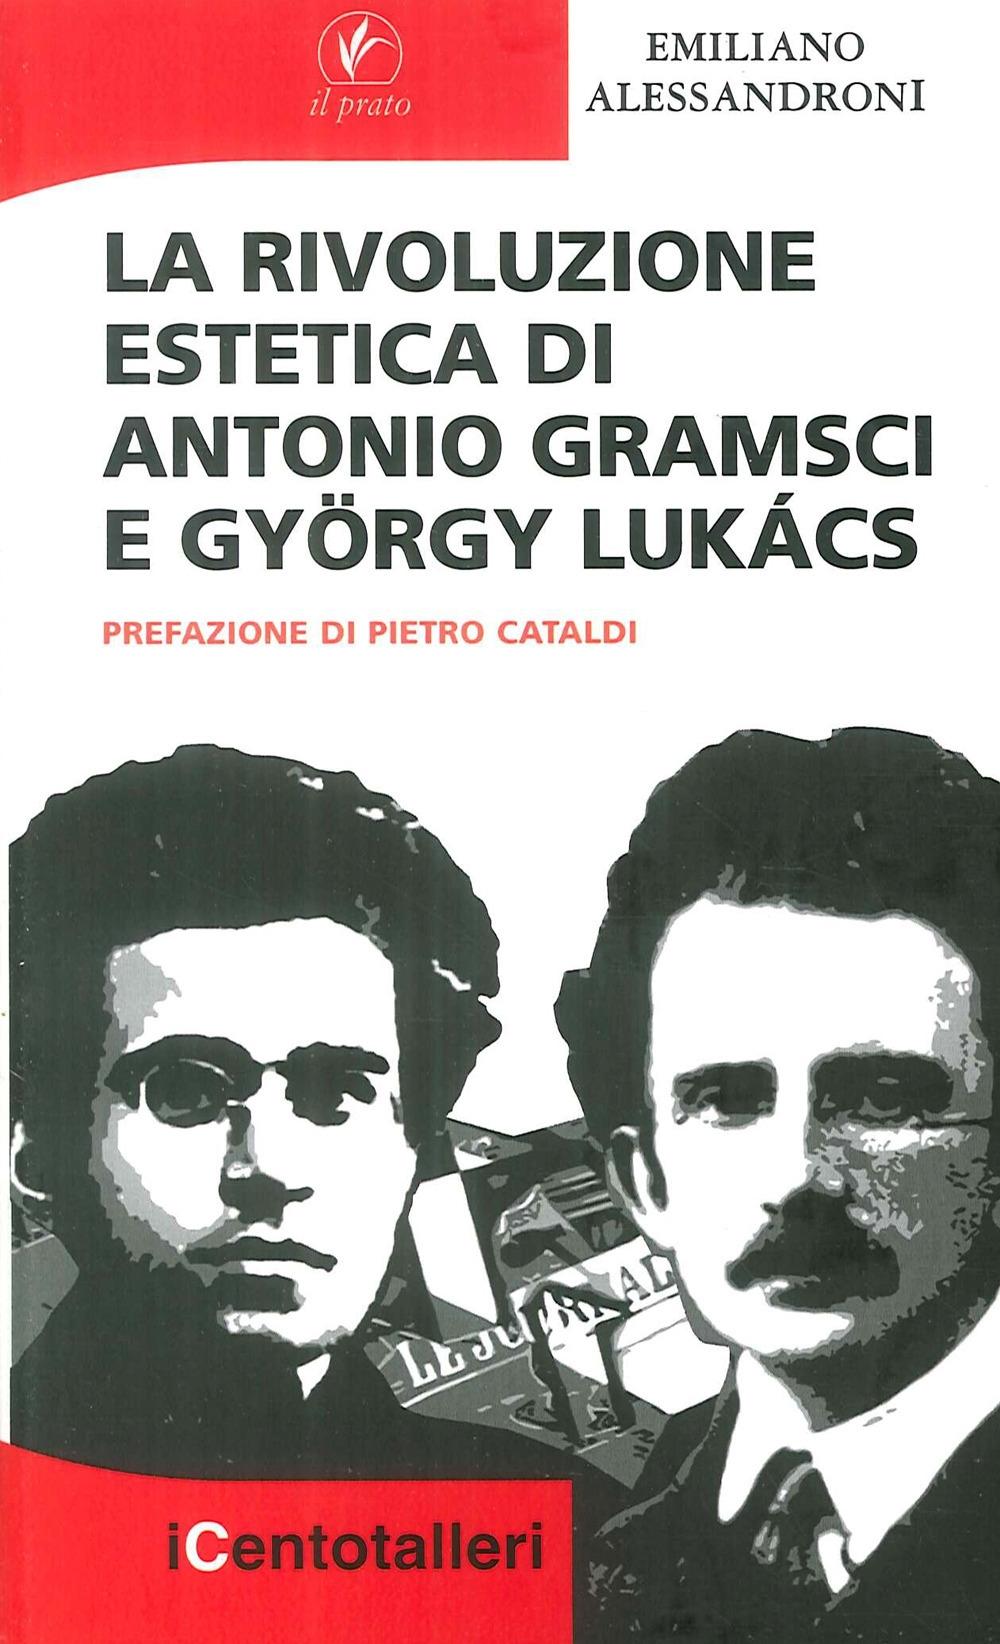 La rivoluzione estetica di Antonio Gramsci e György Lukács